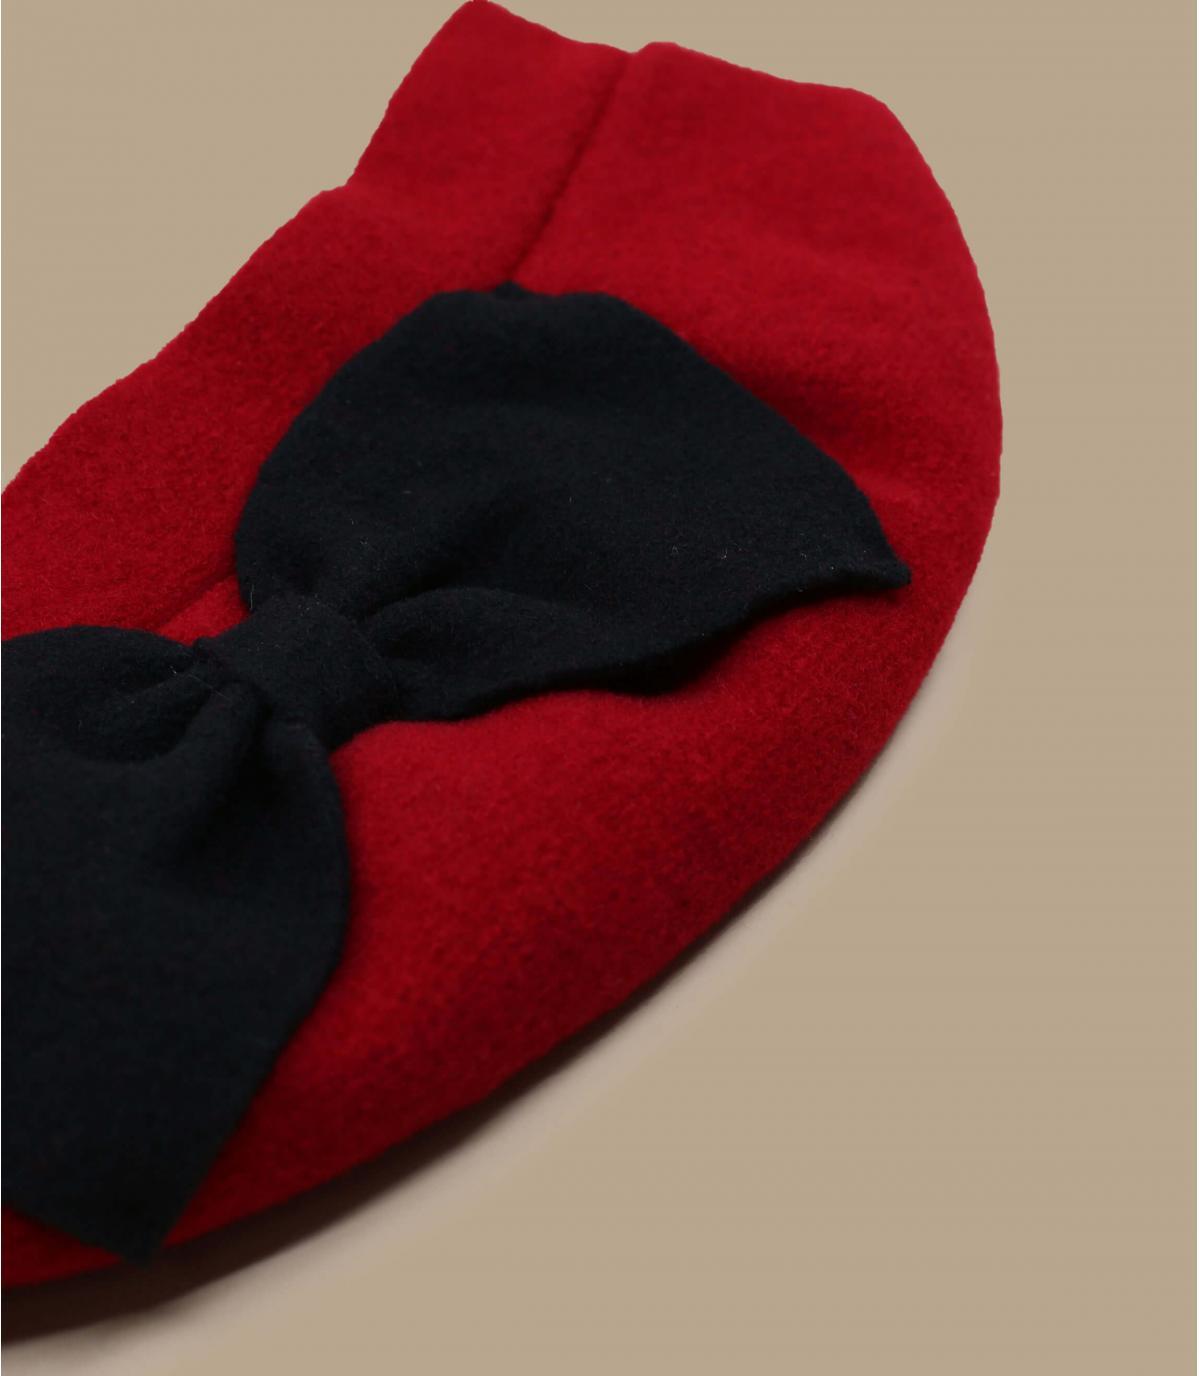 Dettagli Coco hermès black - image 3